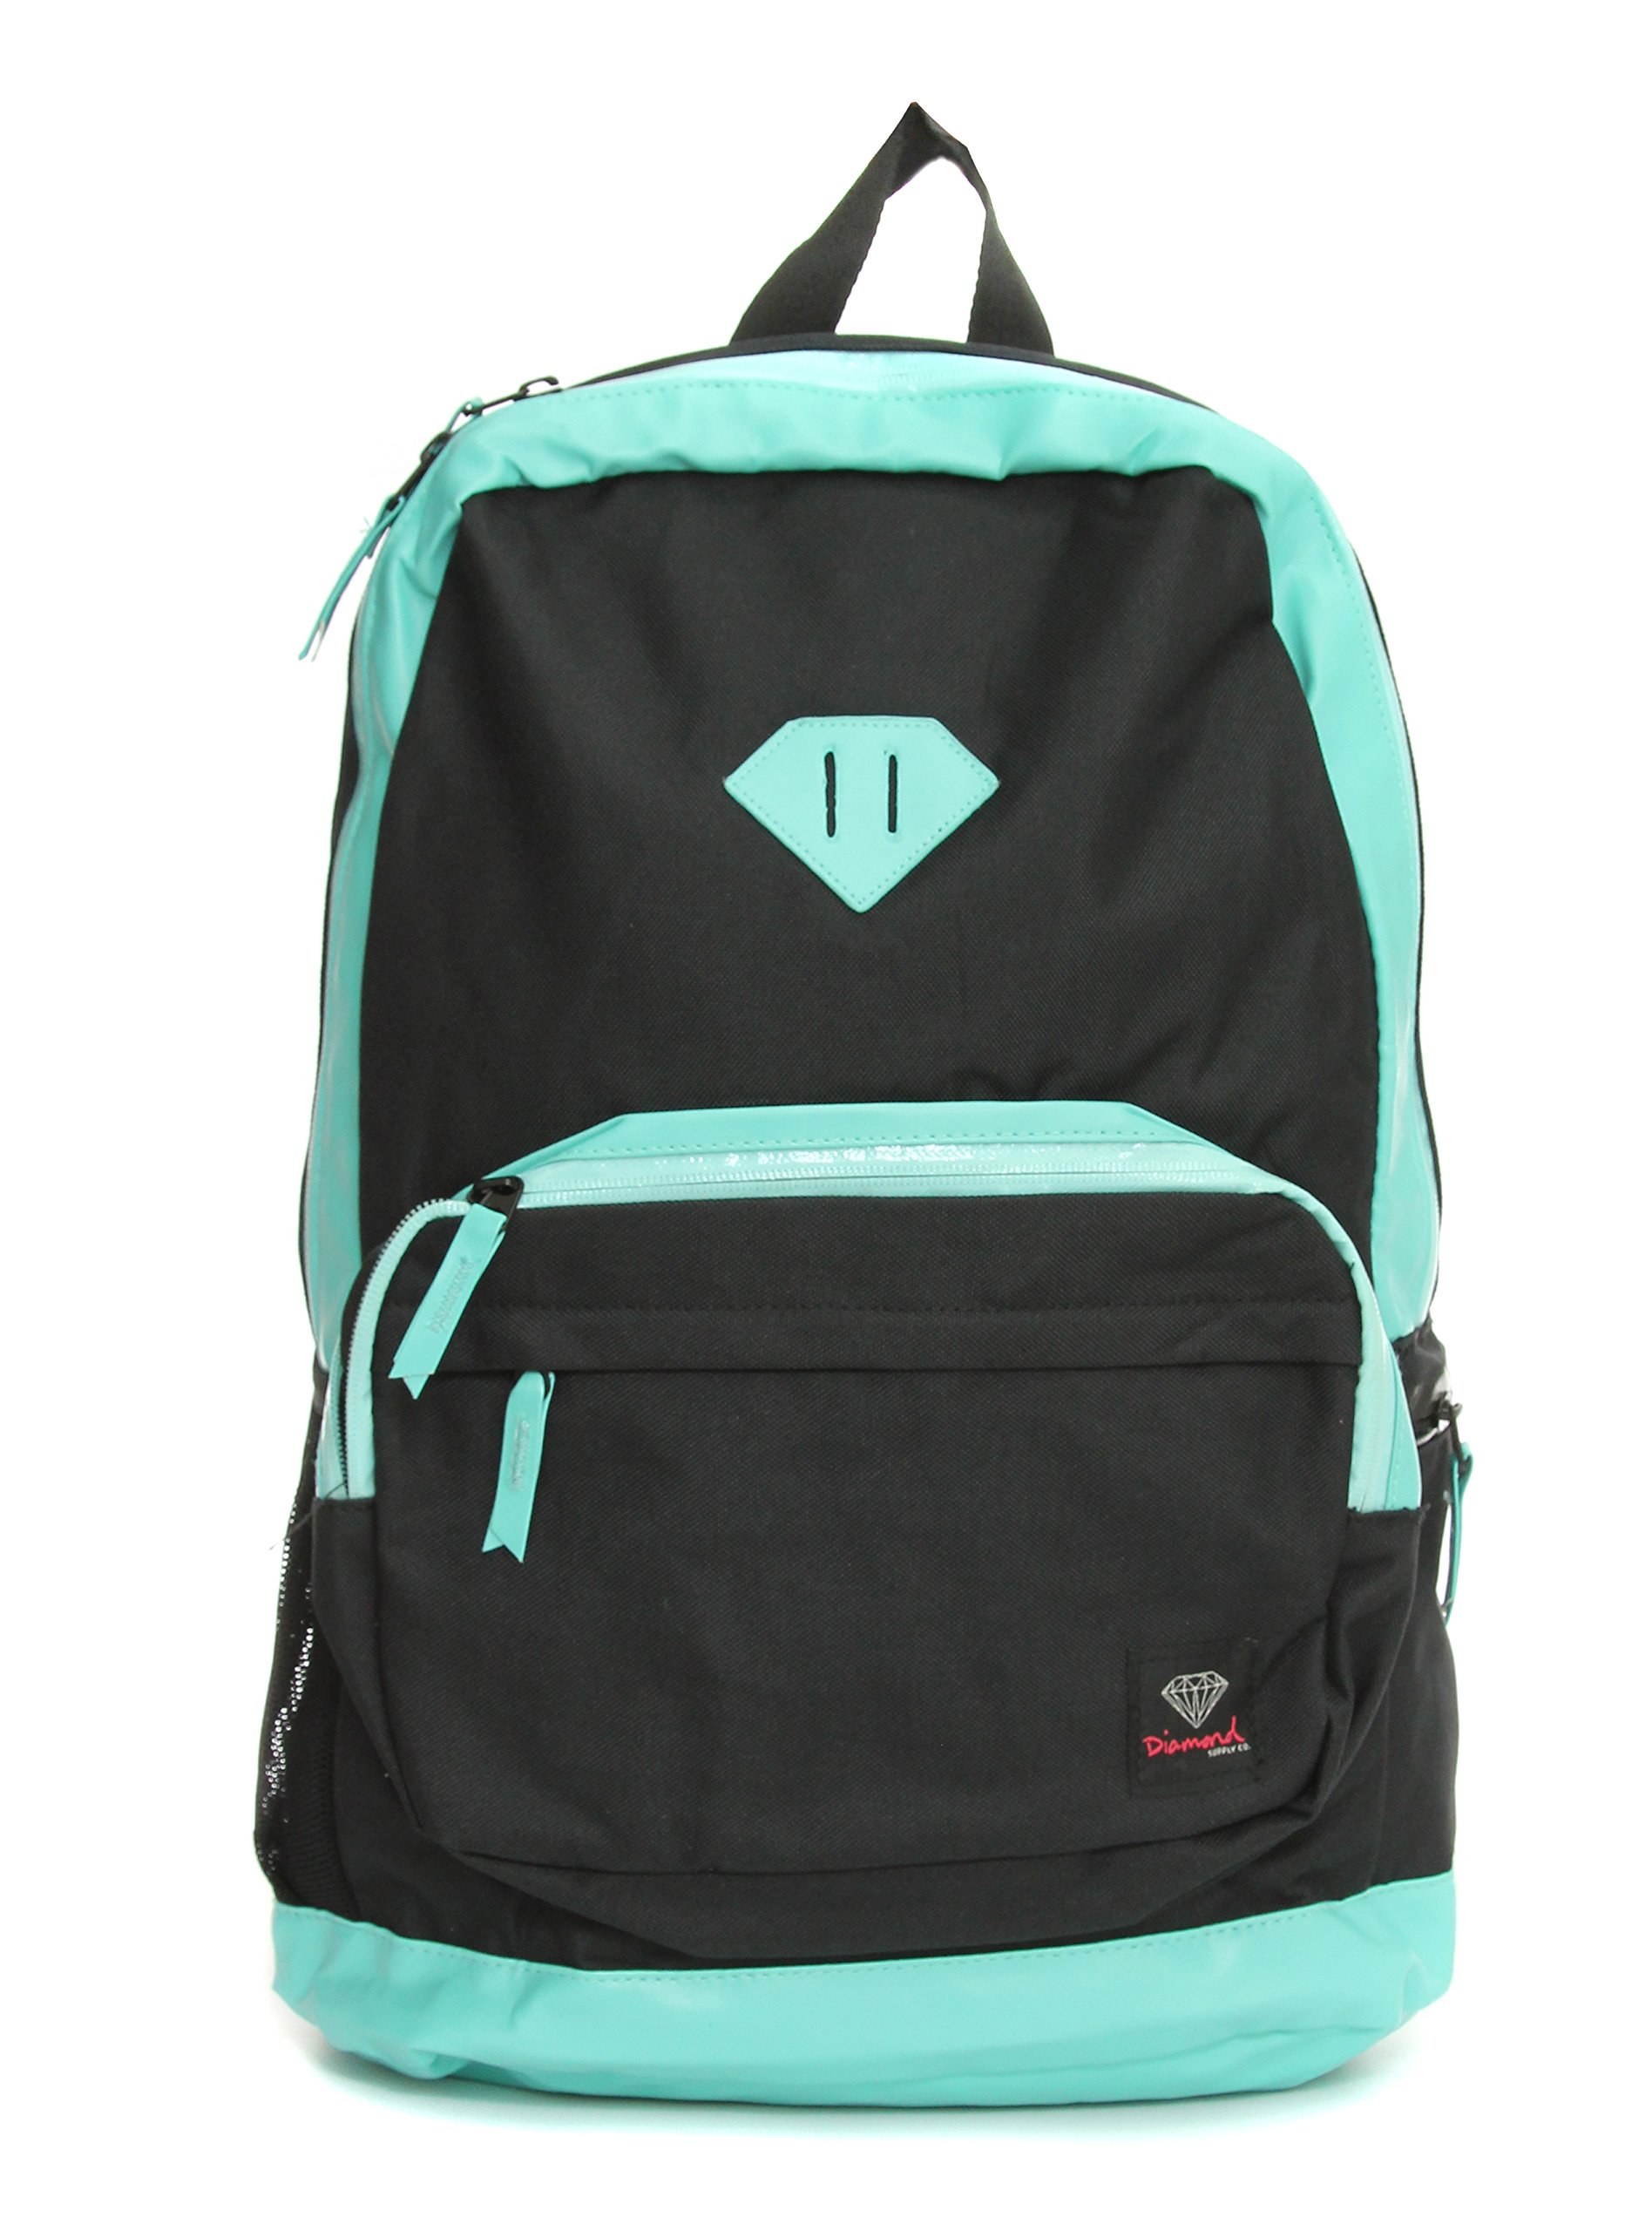 Diamond Supply Co. School Life Backpack-Black/Blue